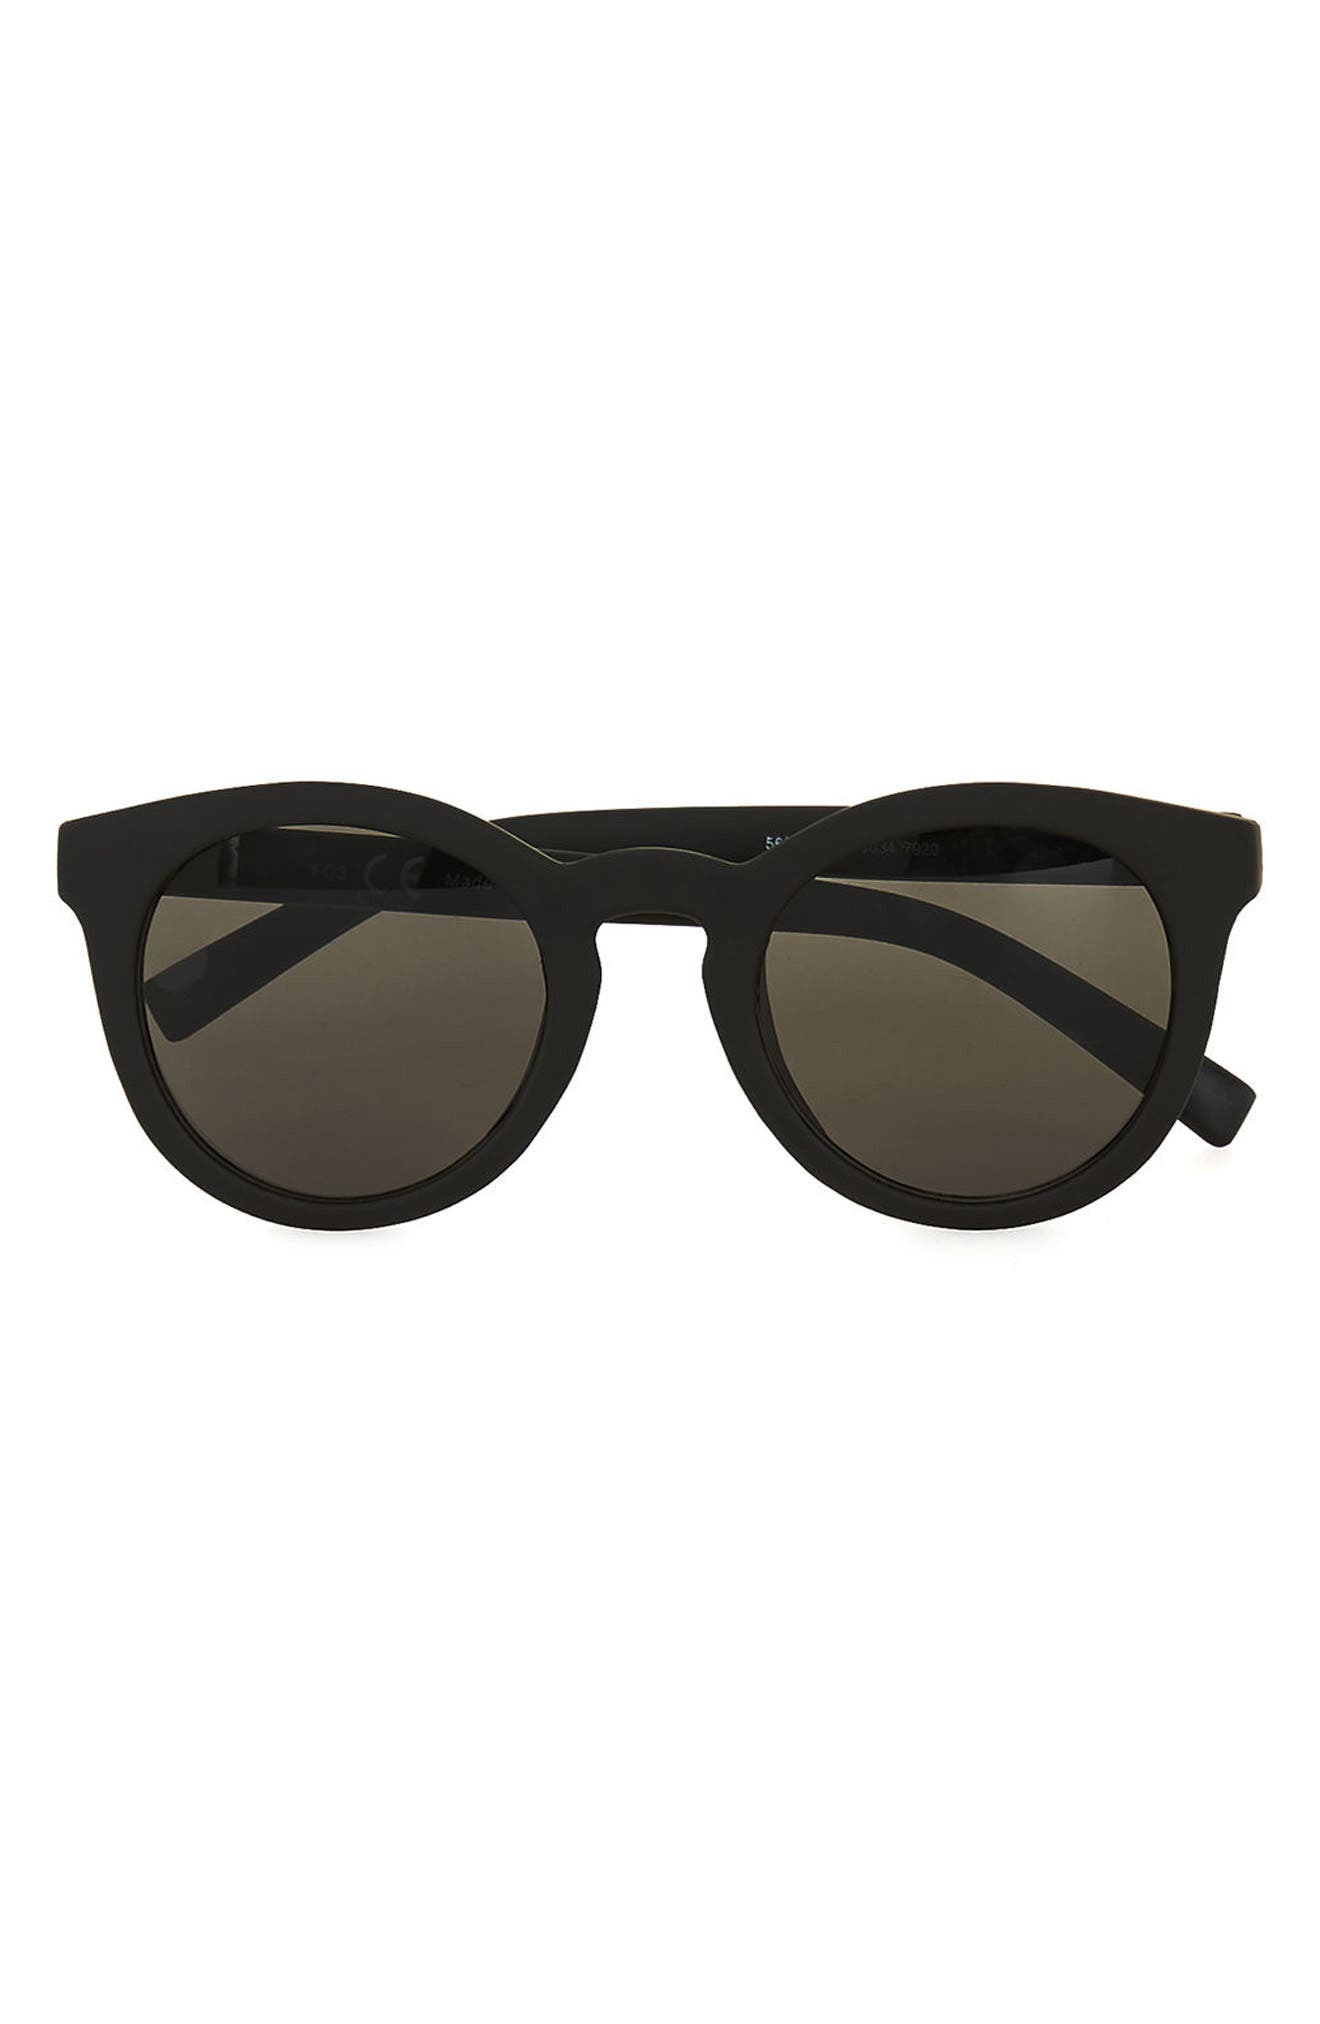 46mm Rubberized Round Sunglasses,                         Main,                         color,